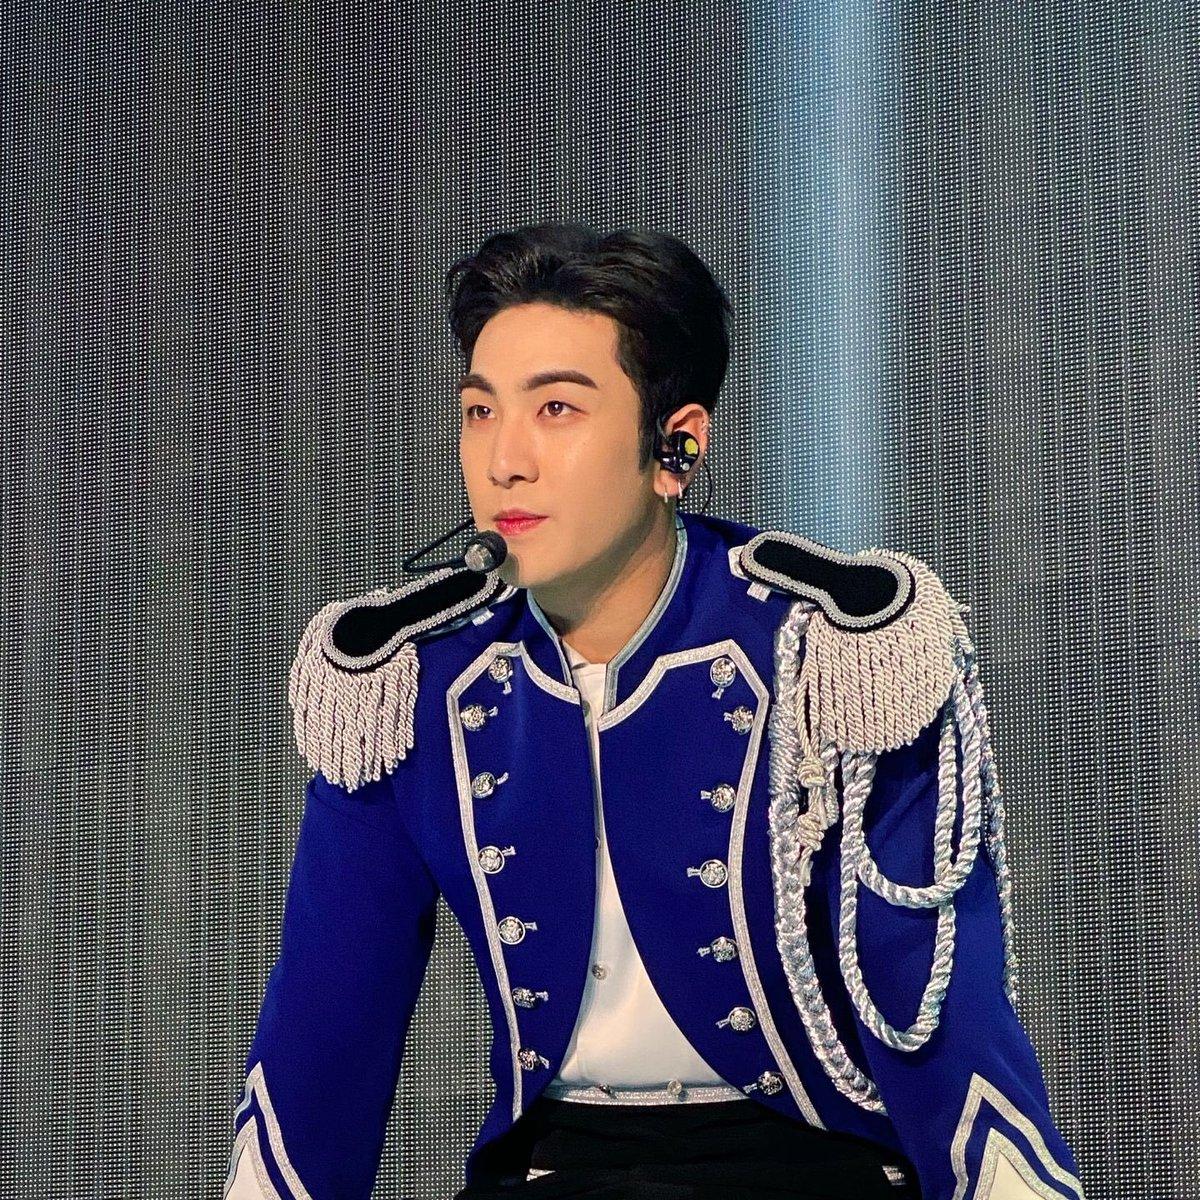 Royal Blue Baekho, Aewol prince🤴  #BAEKHO #백호 #강동호 #동호 #NUEST #뉴이스트 https://t.co/227tRZmRbk